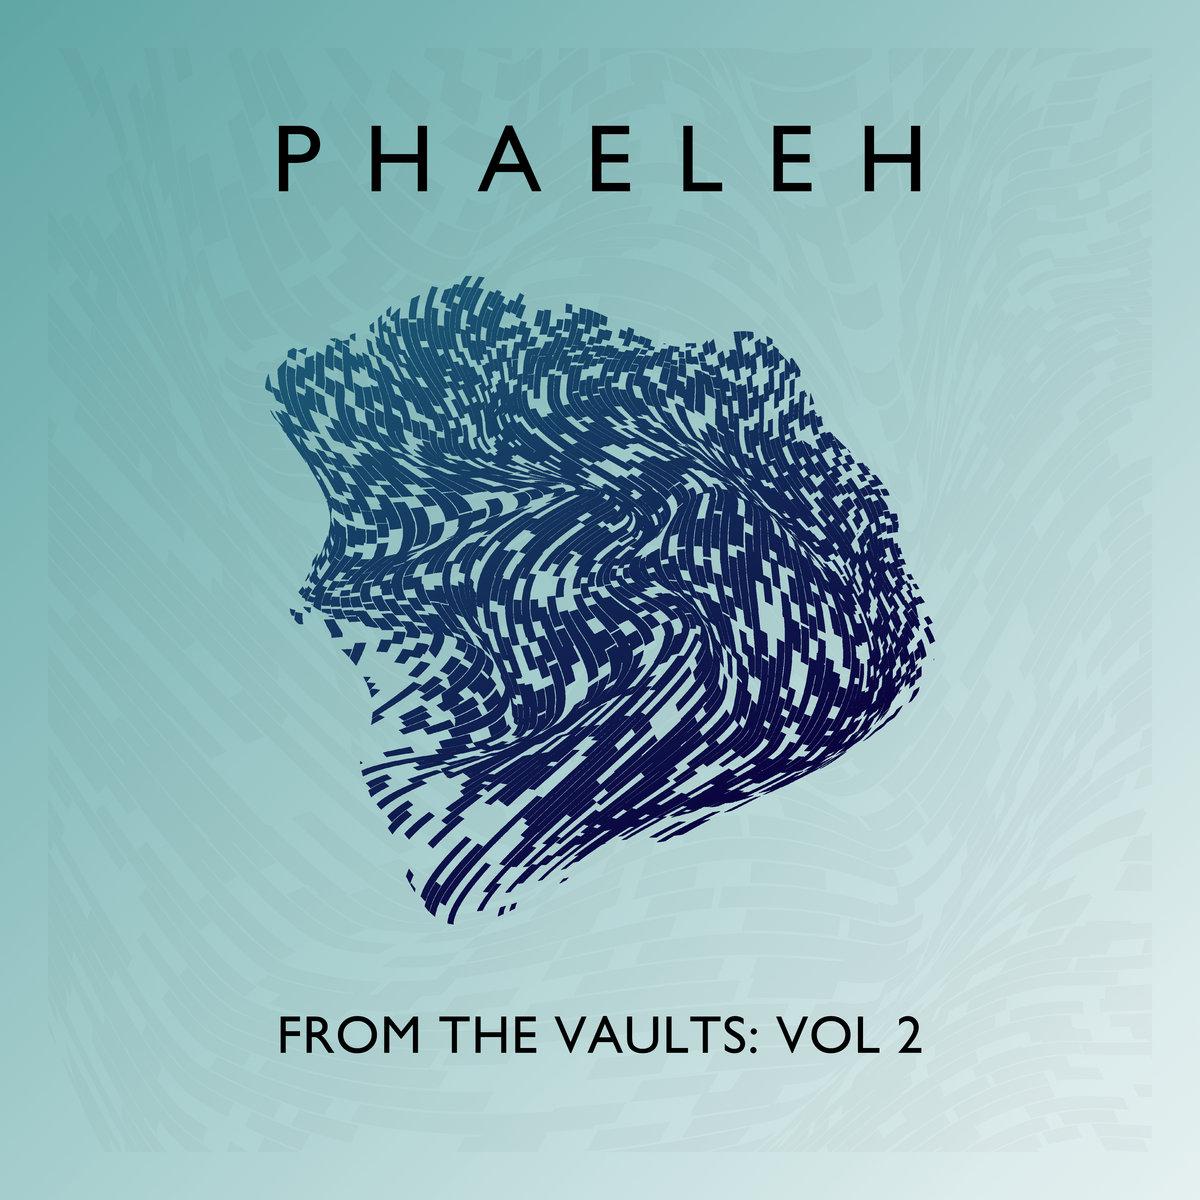 Phaeleh – From the Vaults: Vol 2